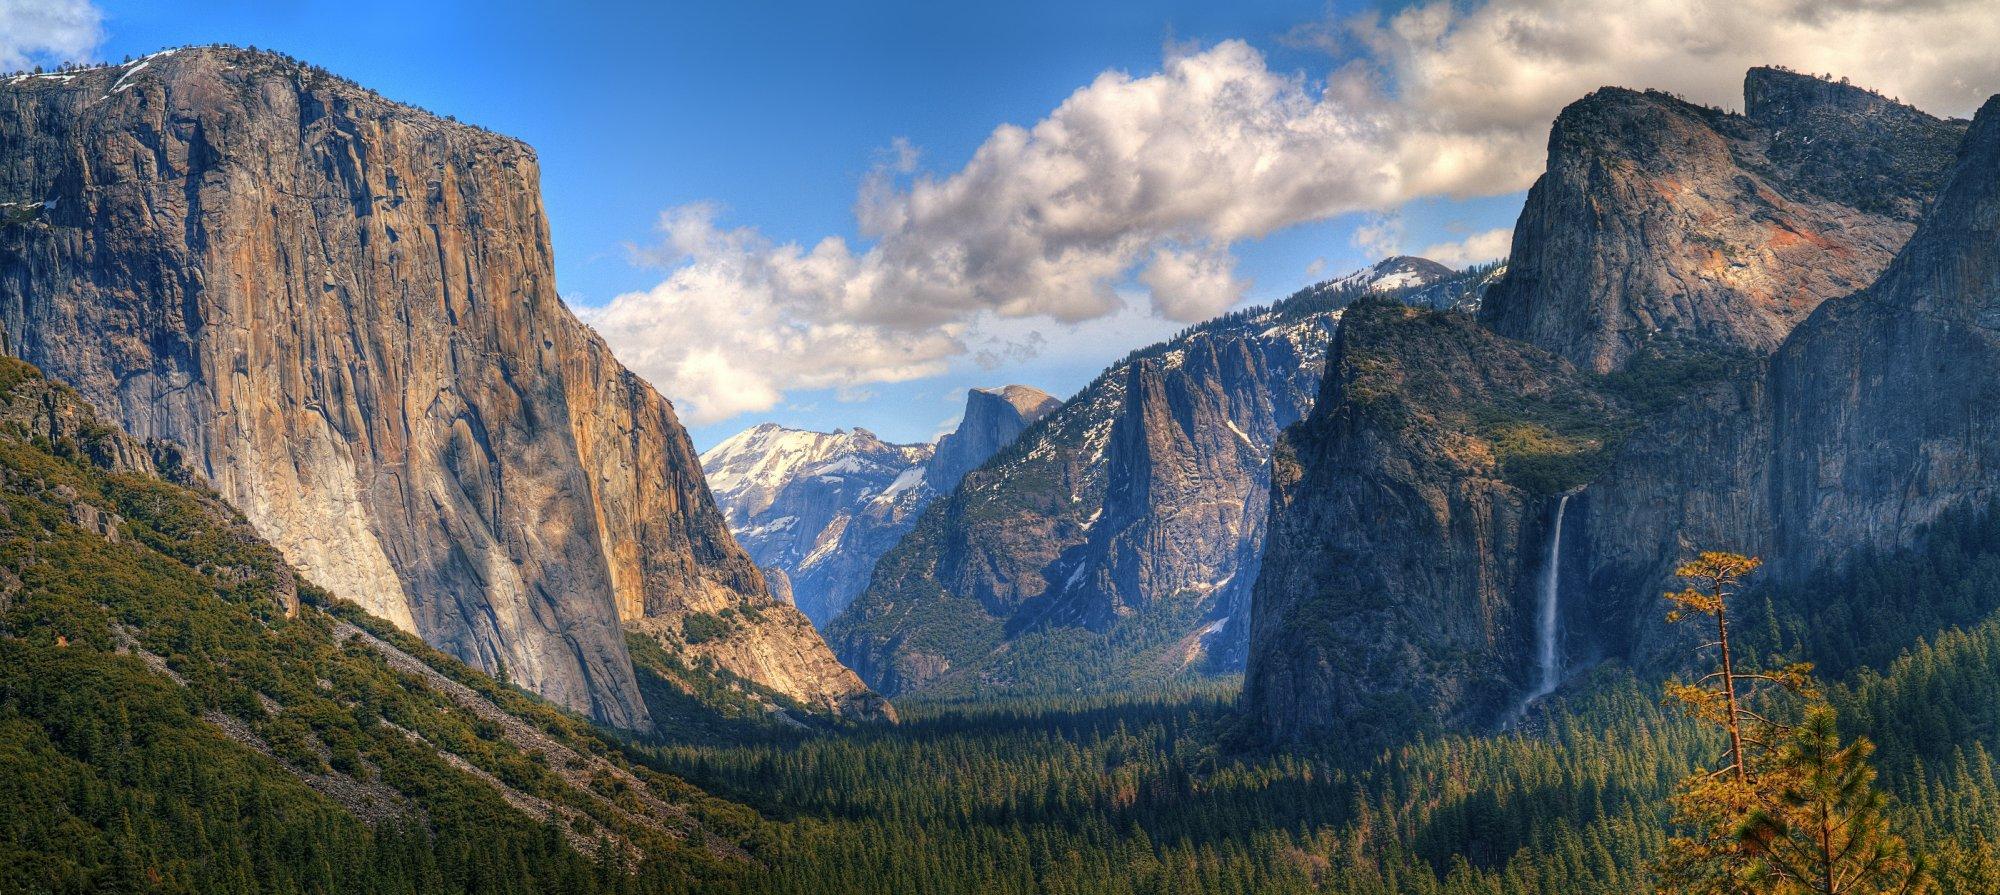 Yosemite National Park. Photo Credit: John Colby